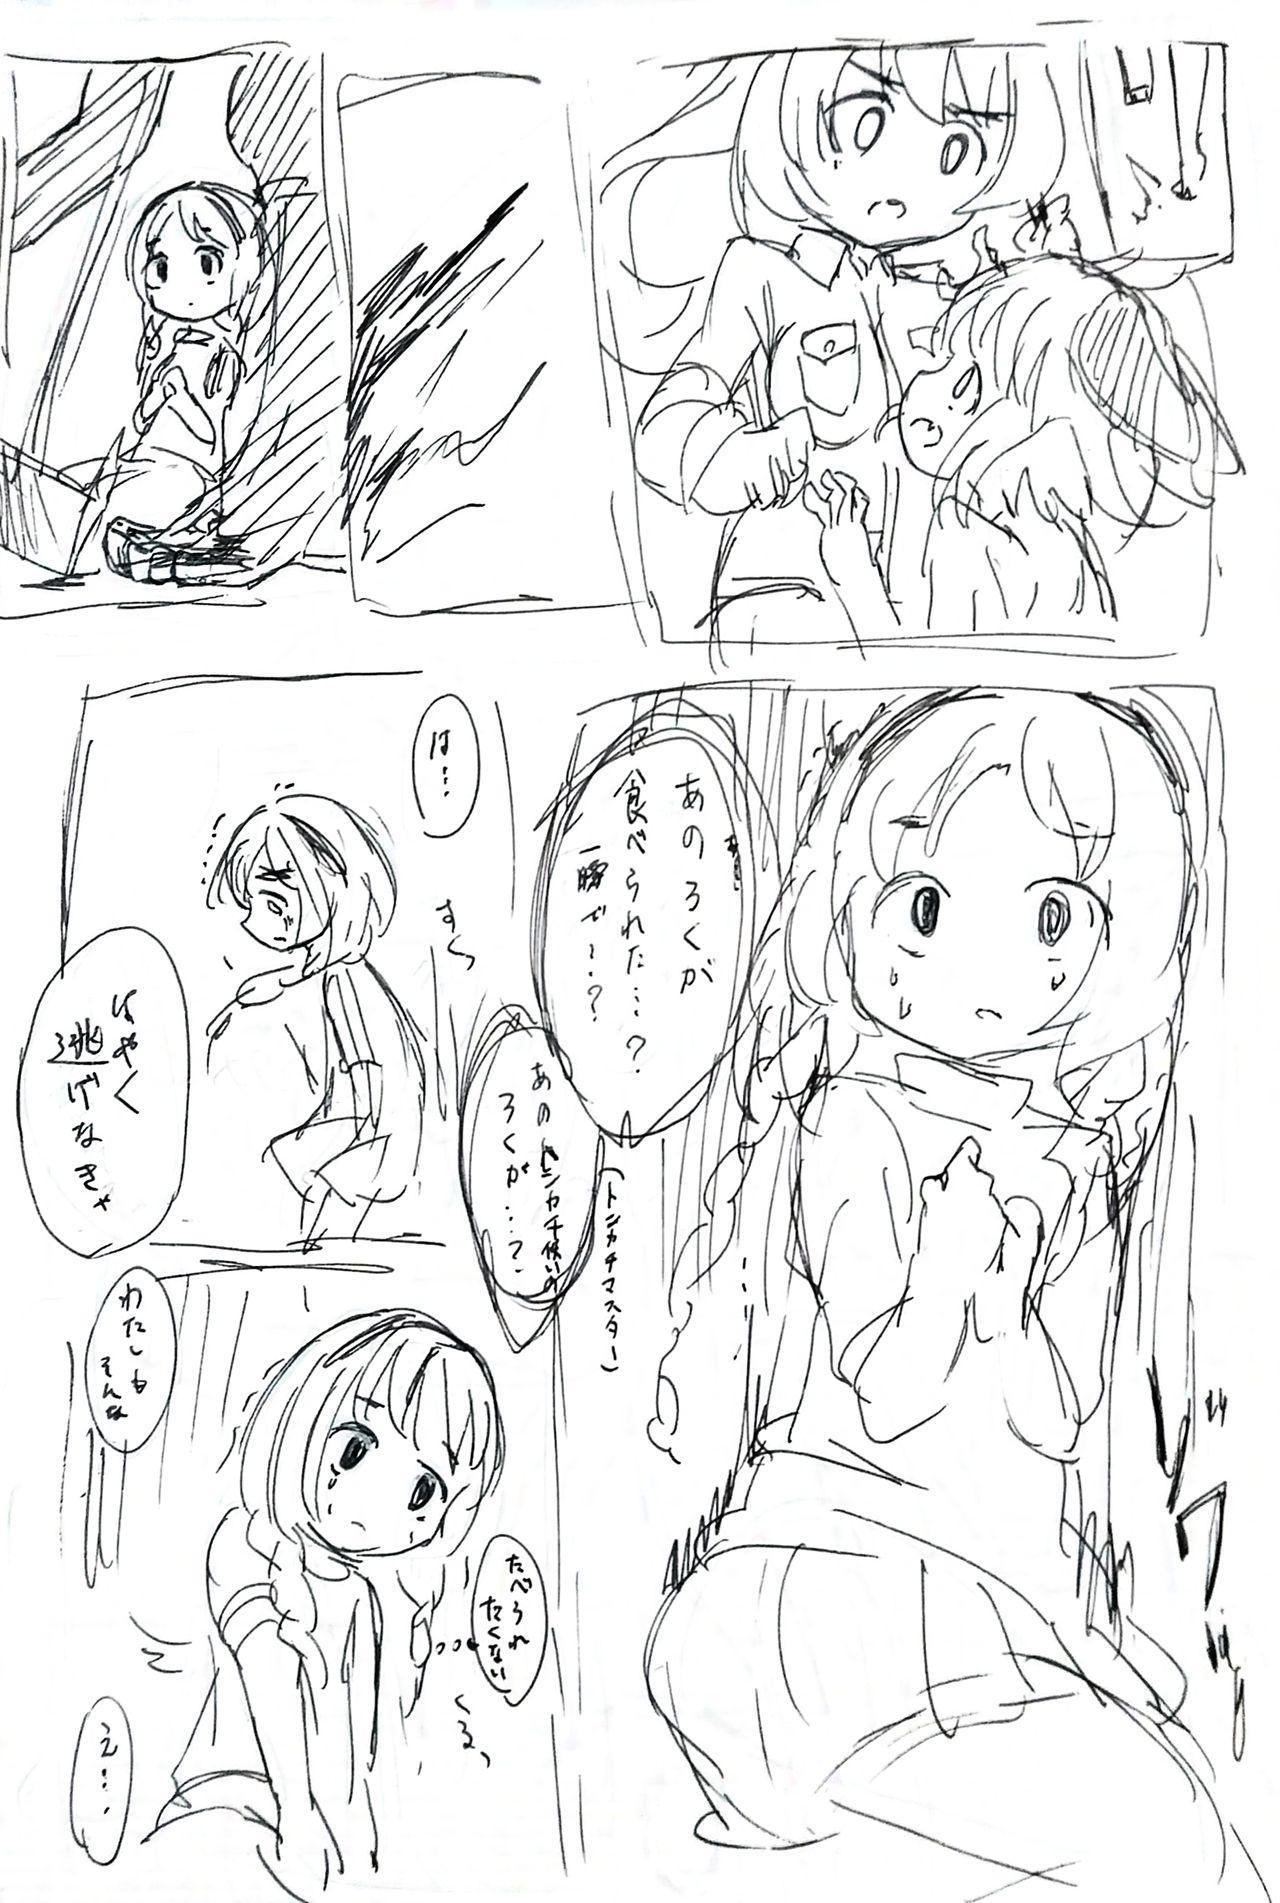 Hisui-chan carnival biyori 4